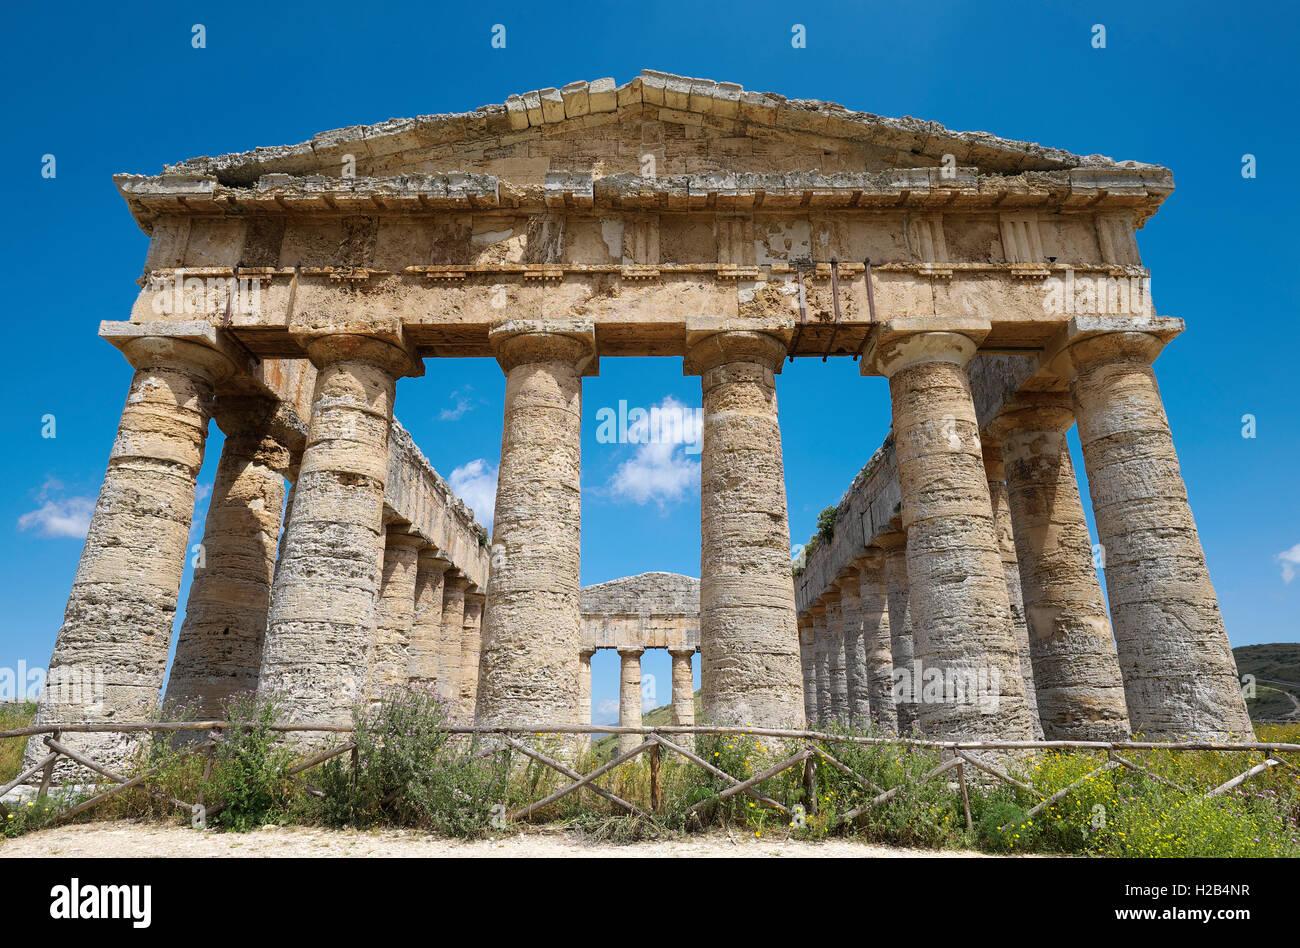 Antiguo Templo de Segesta, provincia de Trapani, Sicilia, Italia Imagen De Stock